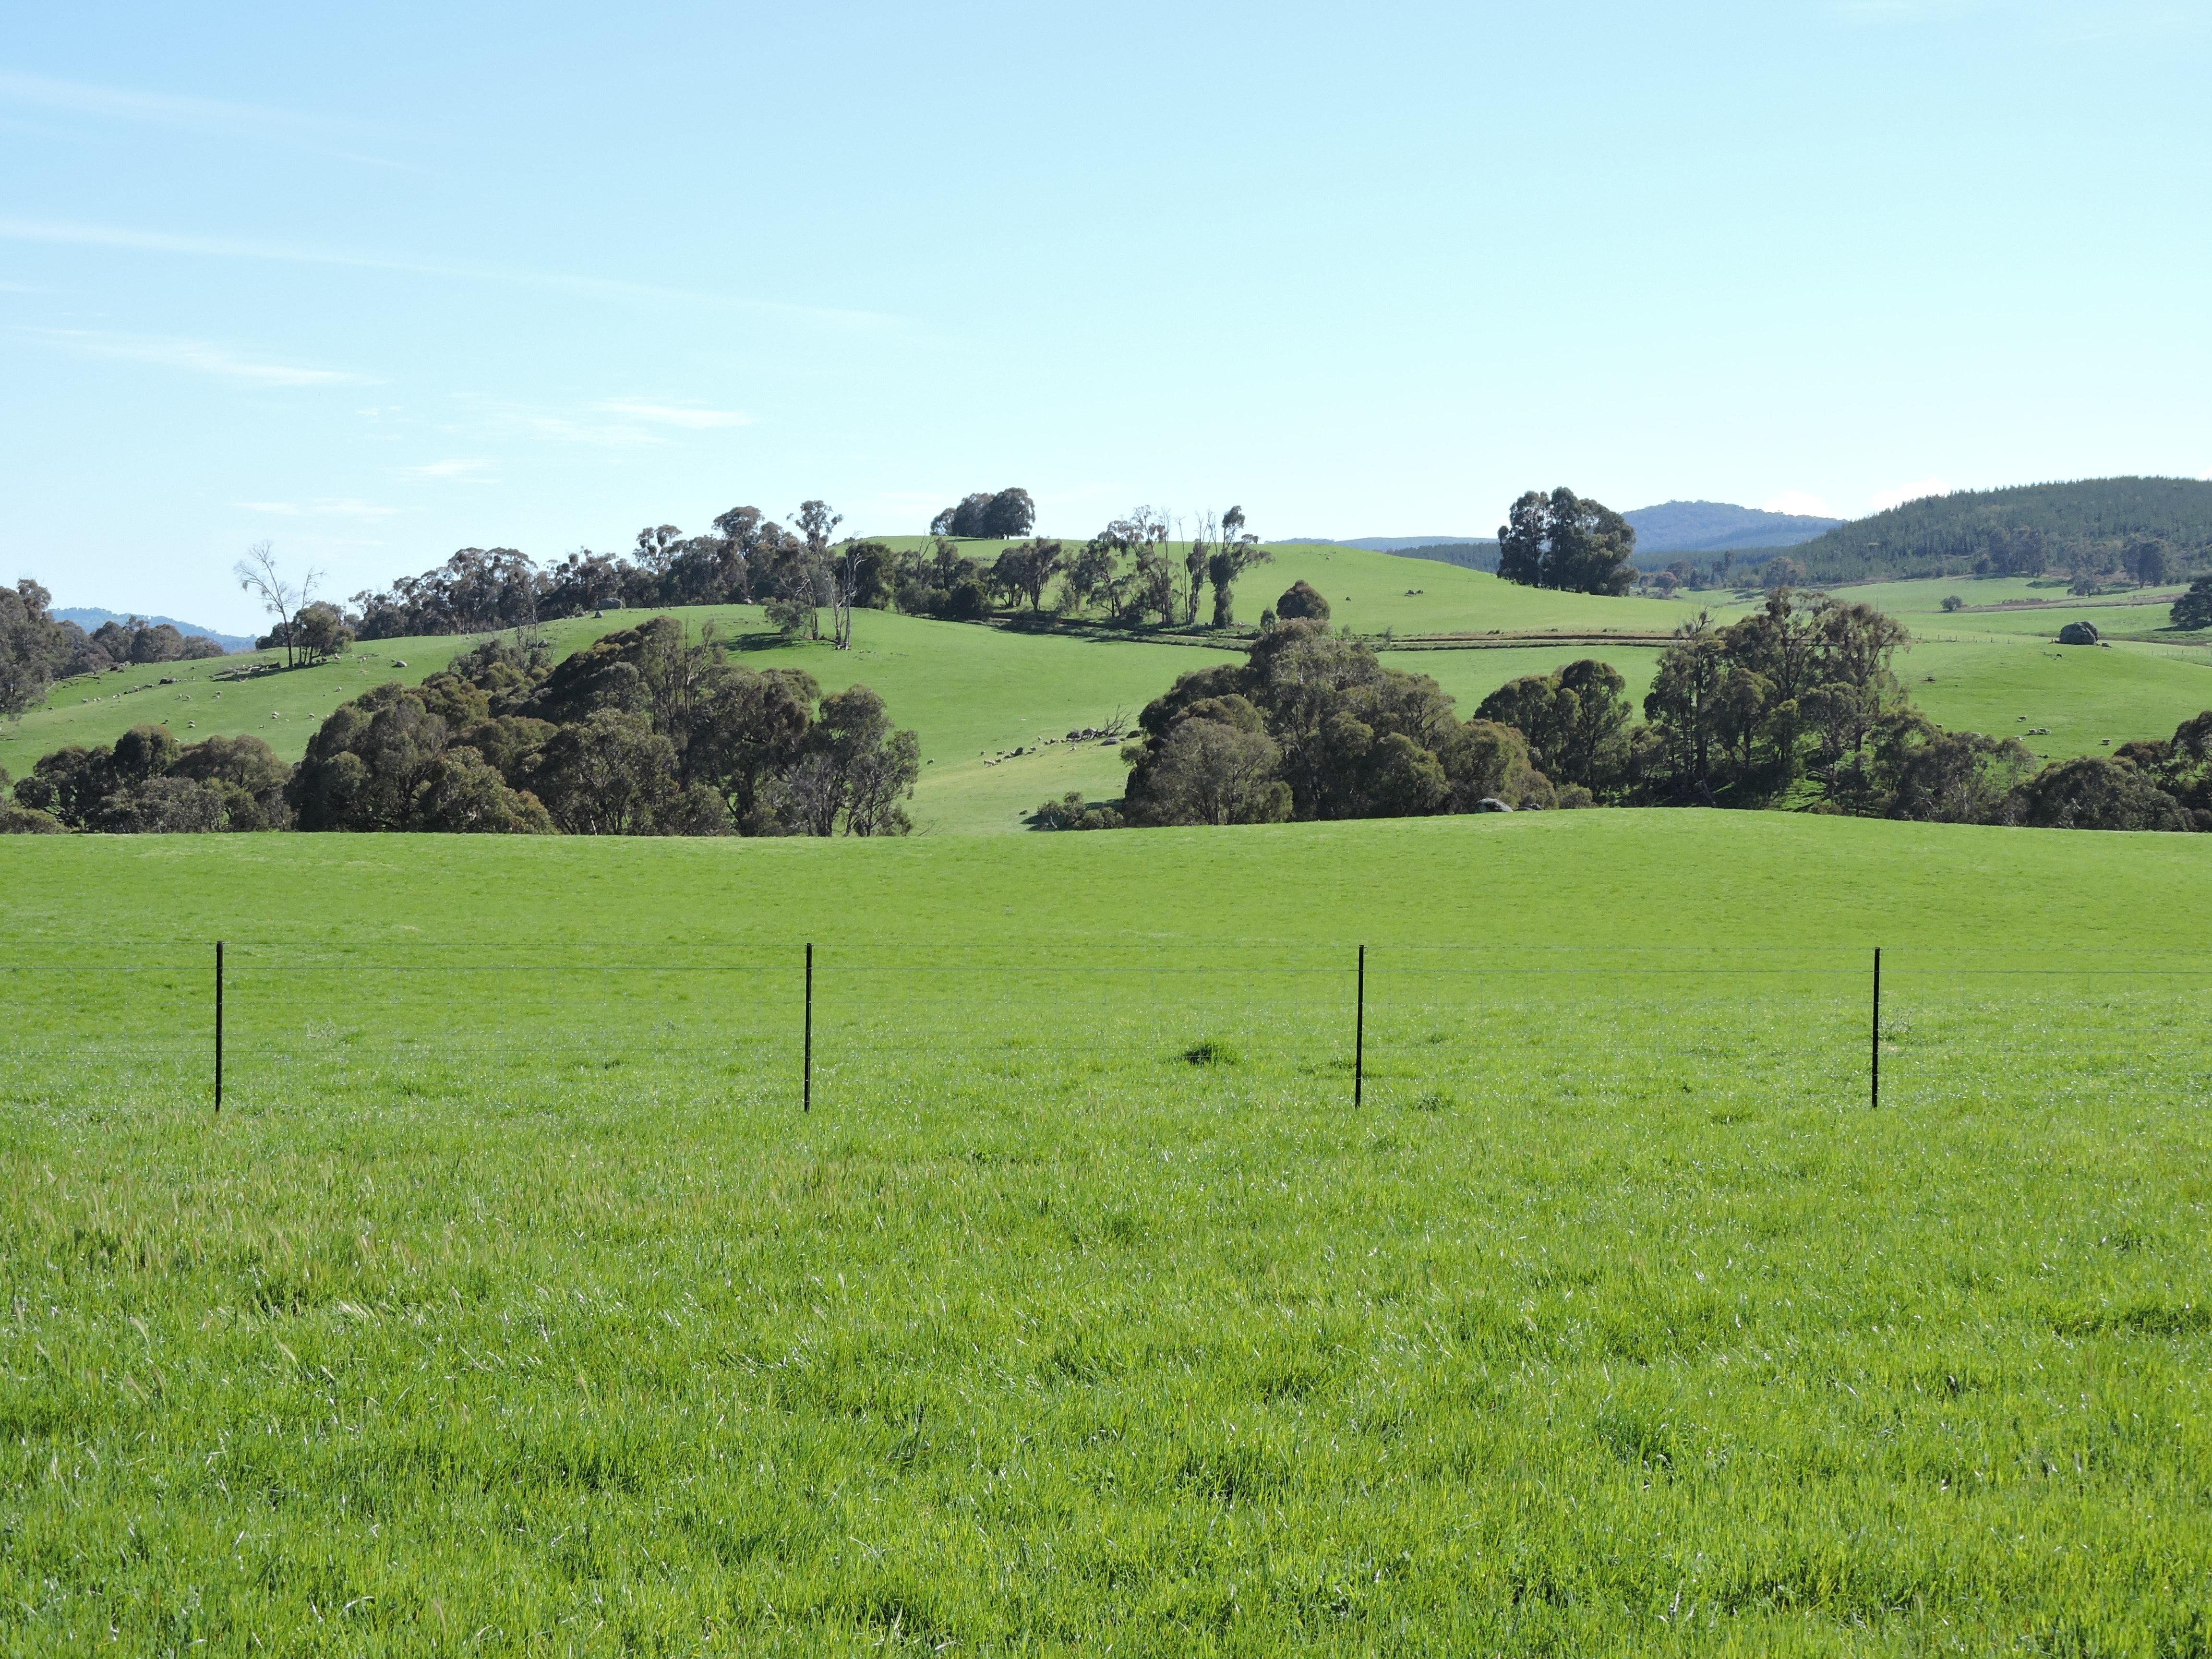 Green paddocks